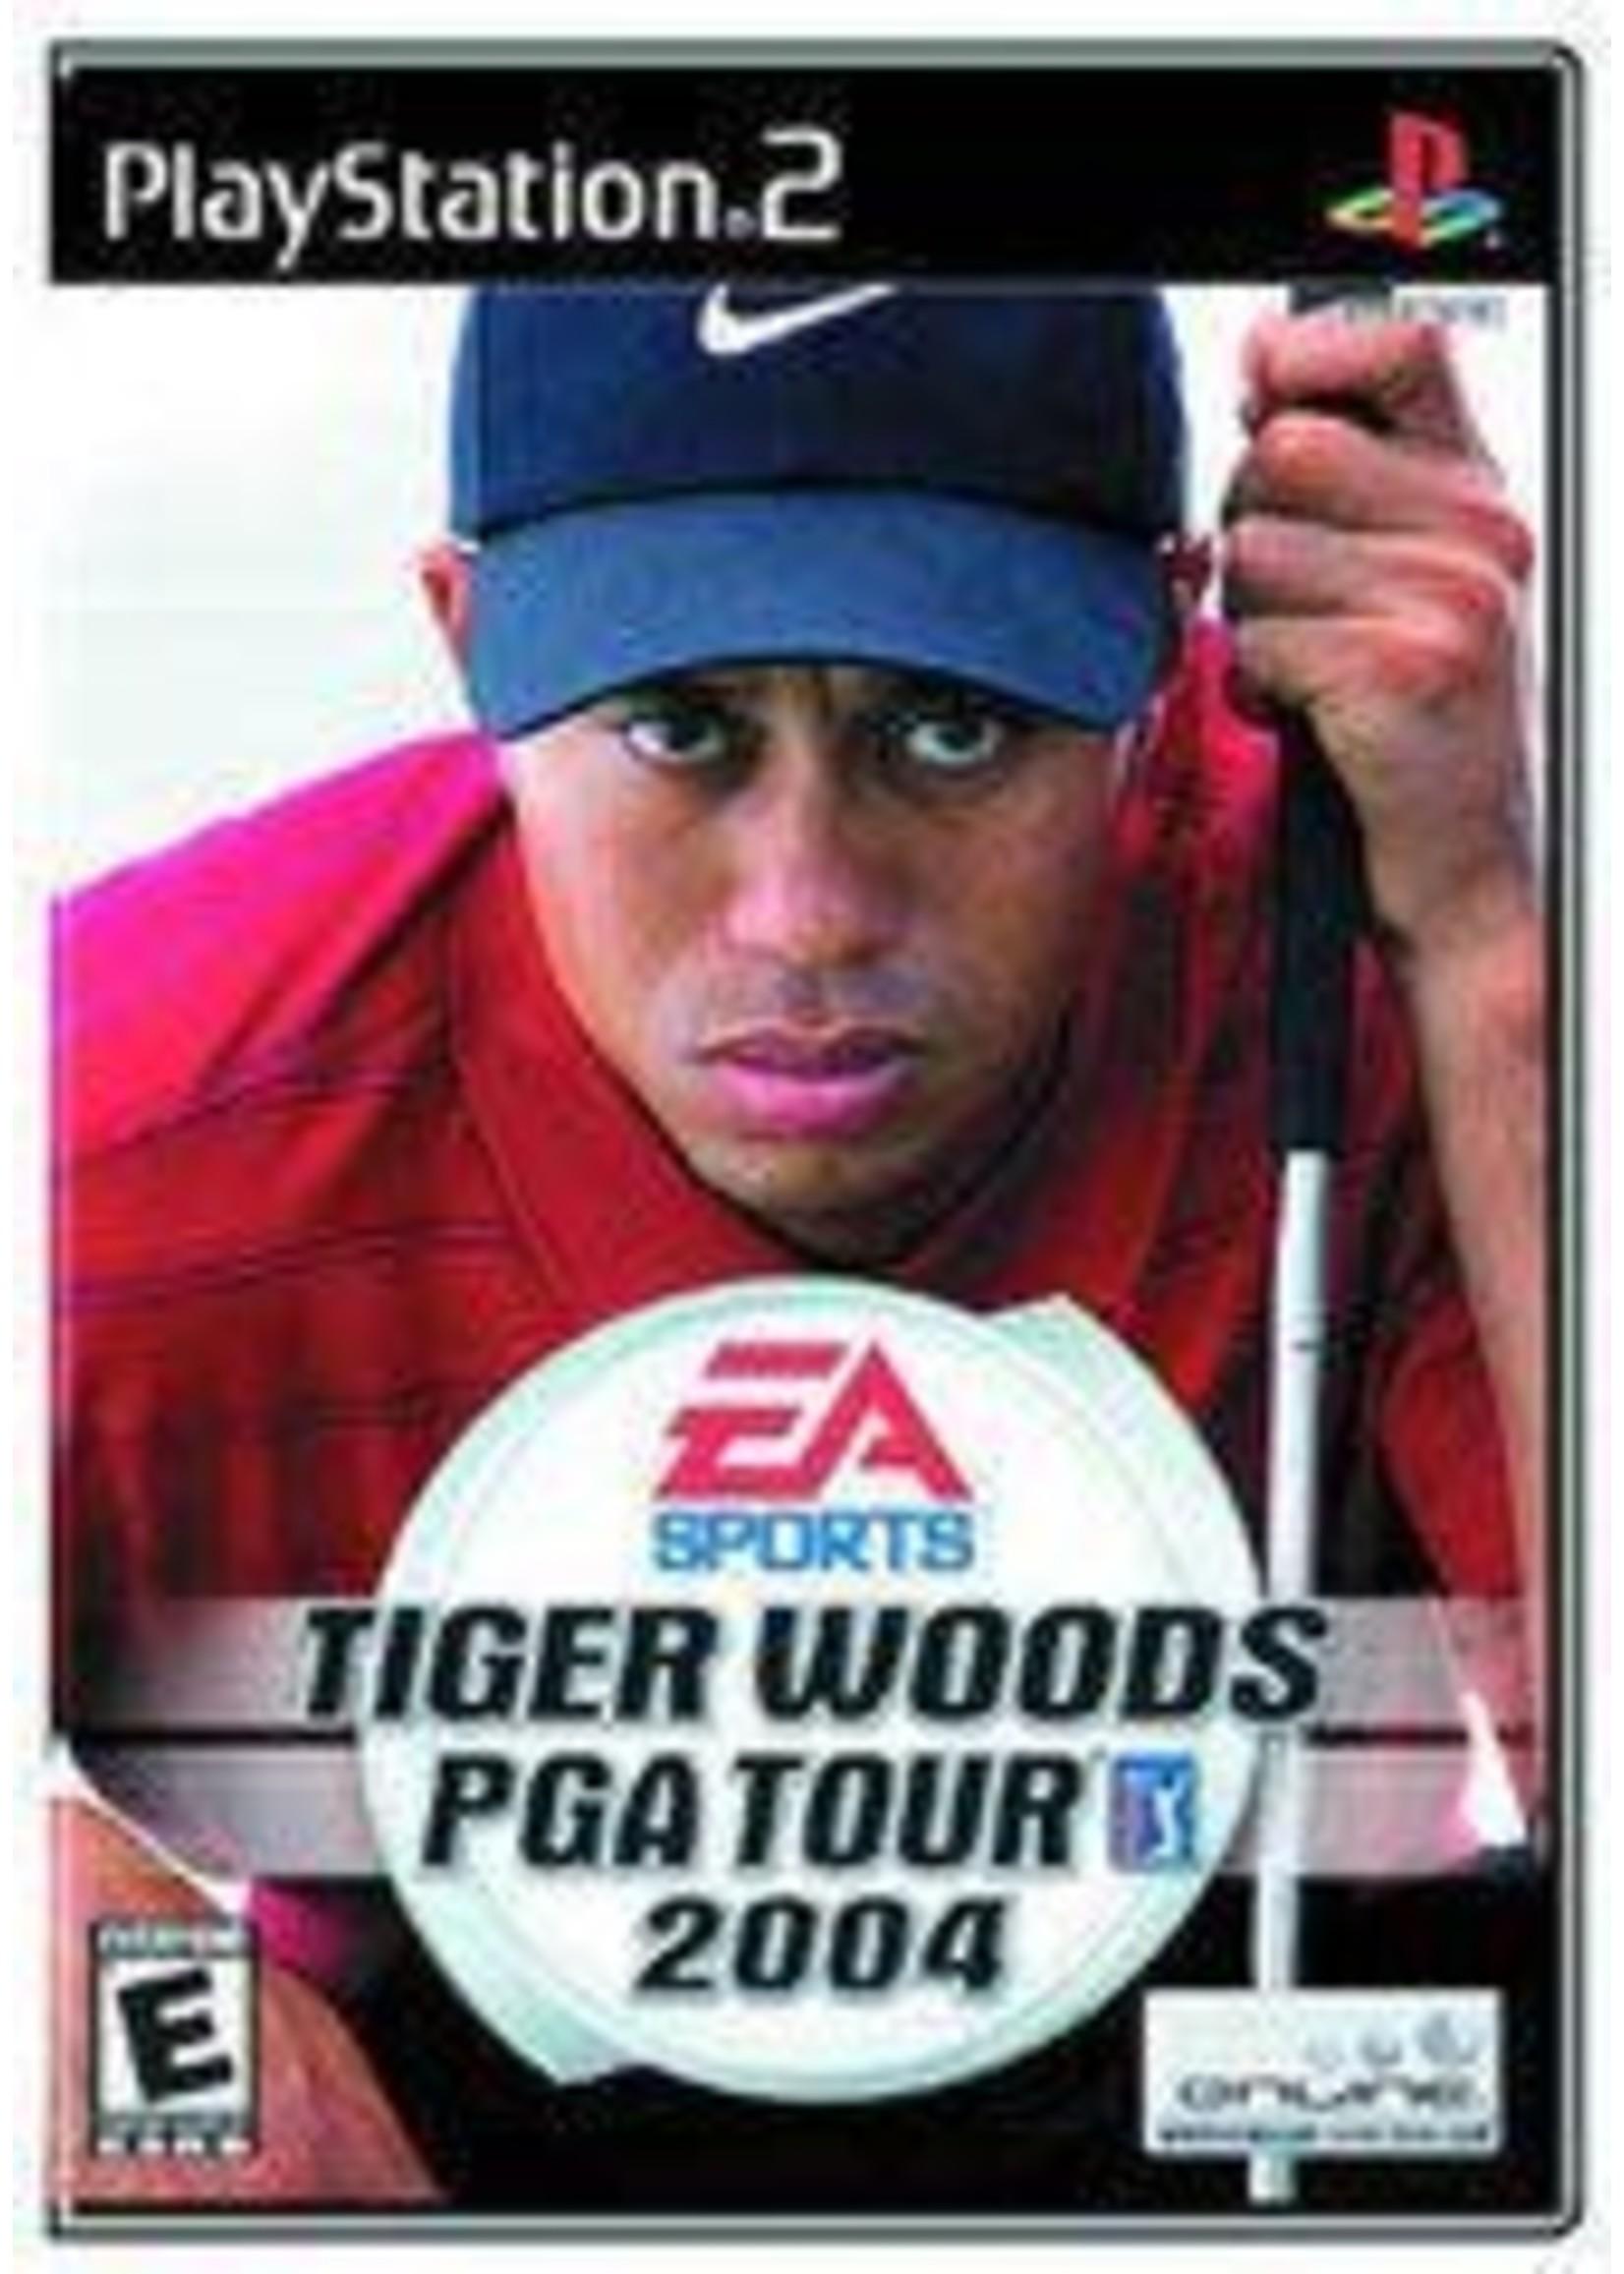 Tiger Woods 2004 Playstation 2